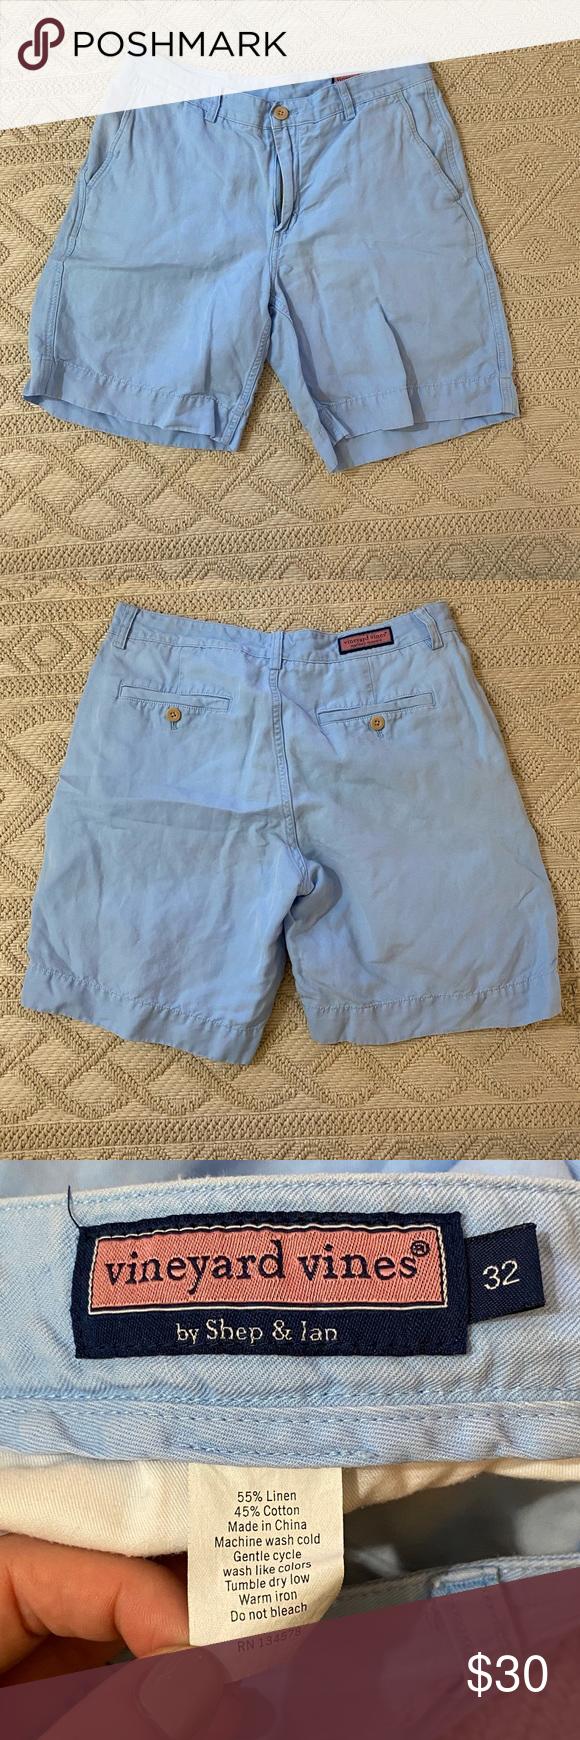 "Vineyard vines light blue shorts island shorts 7"" Vineyard vines light blue men's shorts Island shorts 7 inch Vineyard Vines Shorts #lightblueshorts"